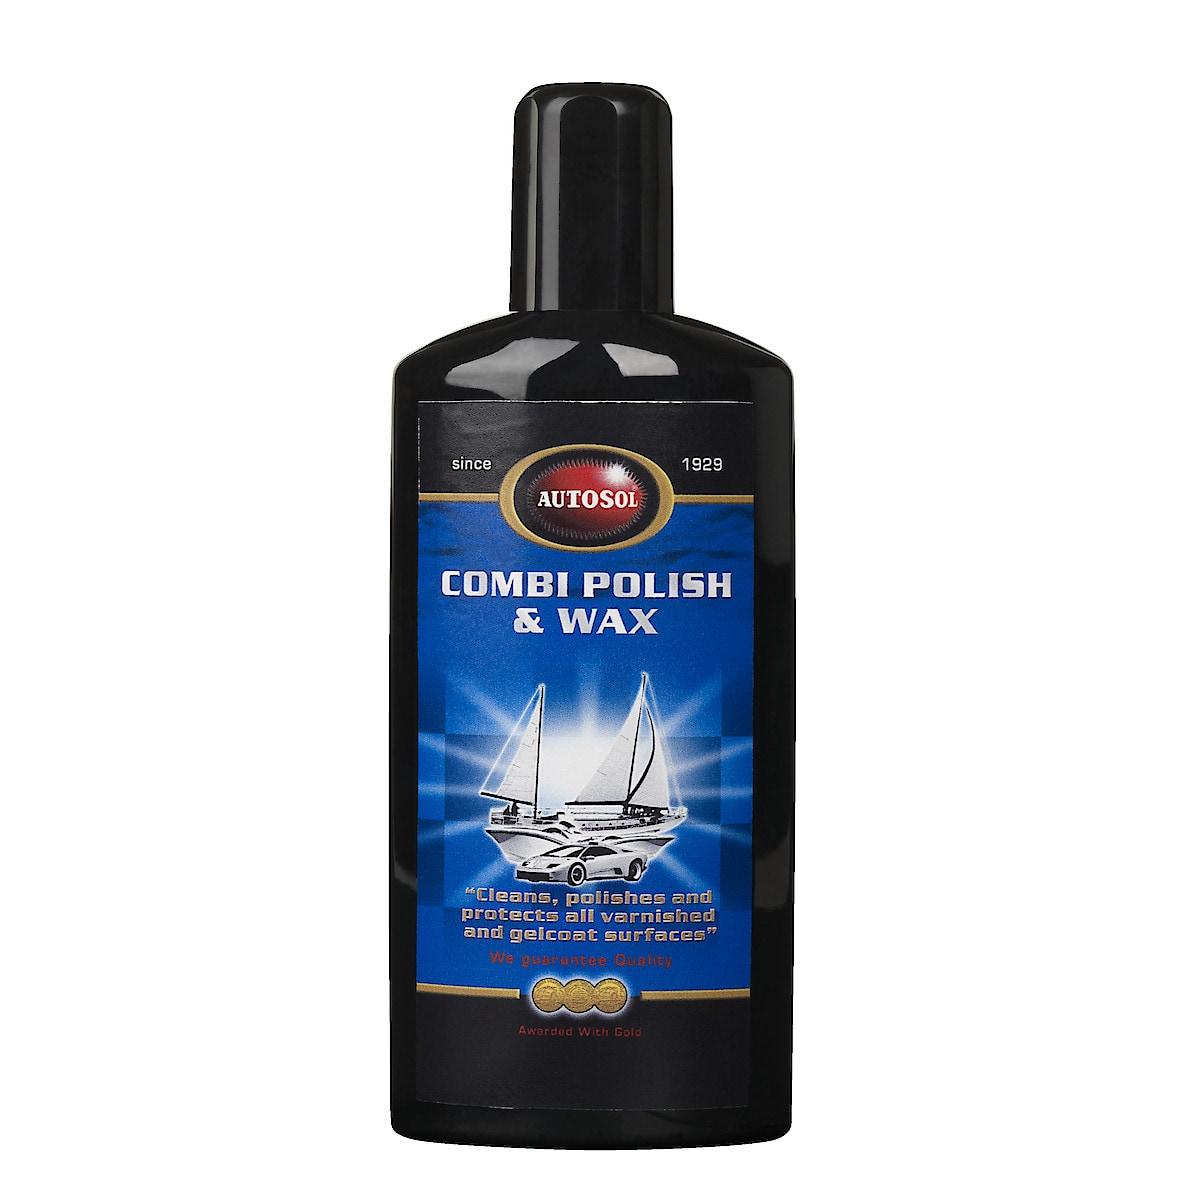 Combi polish Autosol